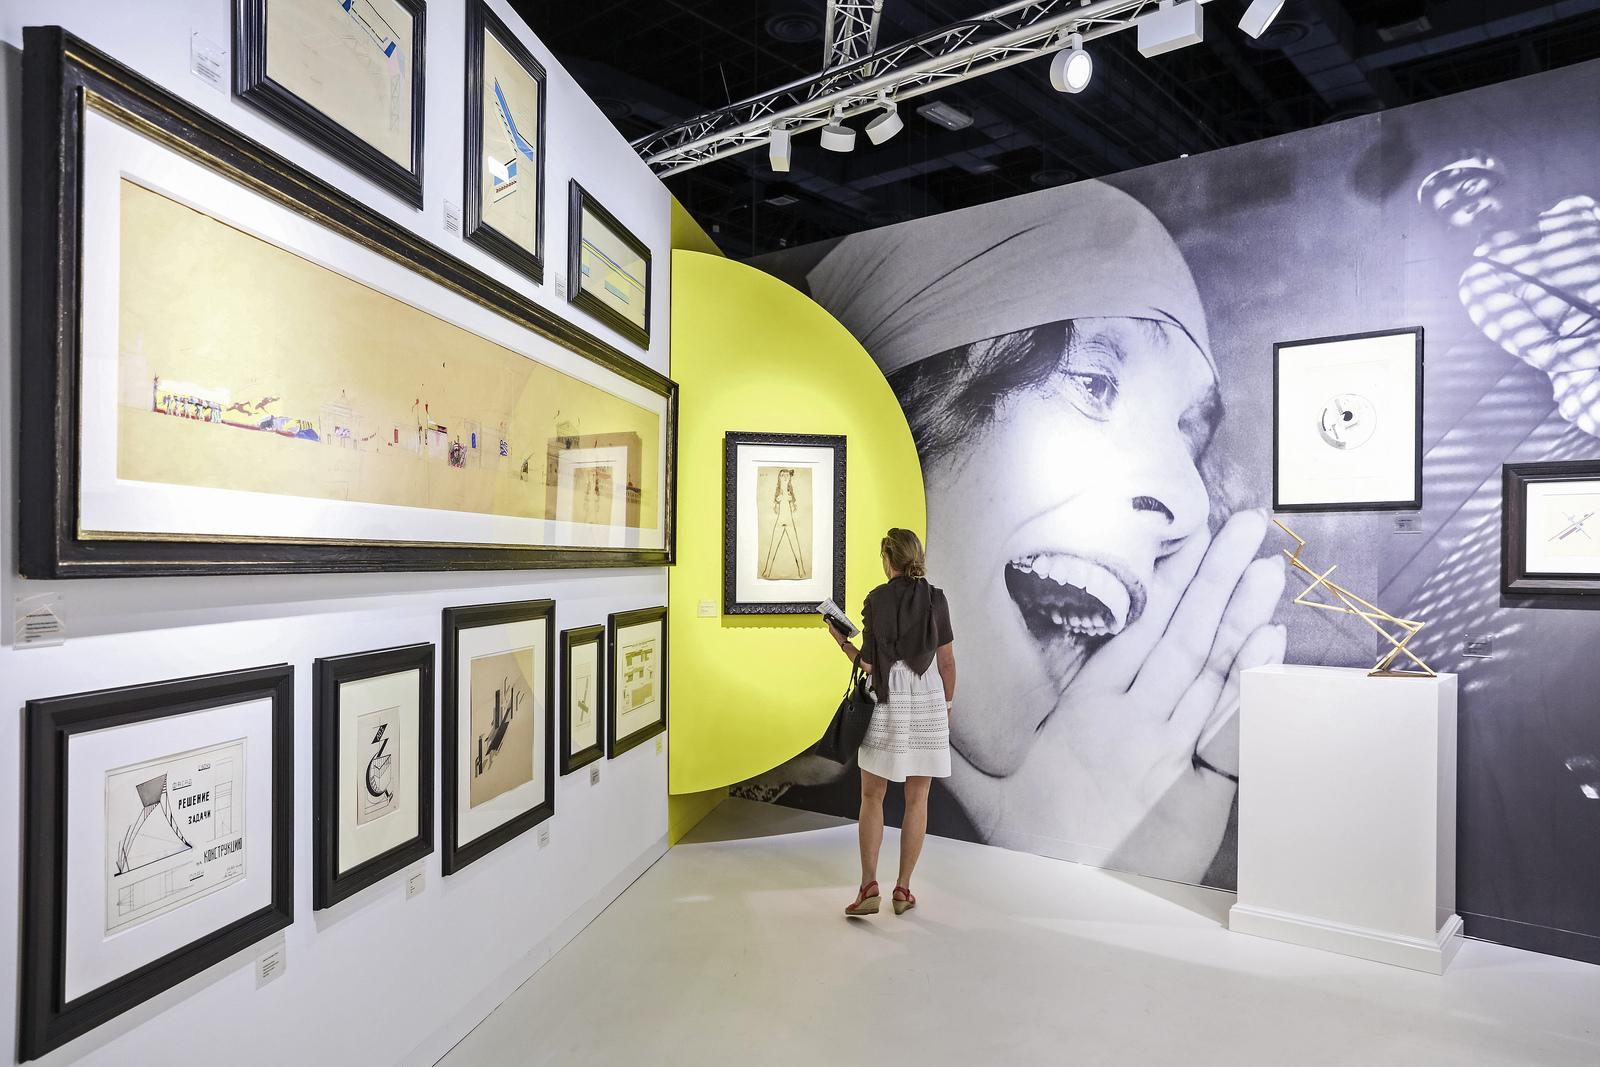 Galerie Gmurzynska at Art Basel in Miami Beach 2016. Photo: © Charles Roussel & Ocula.